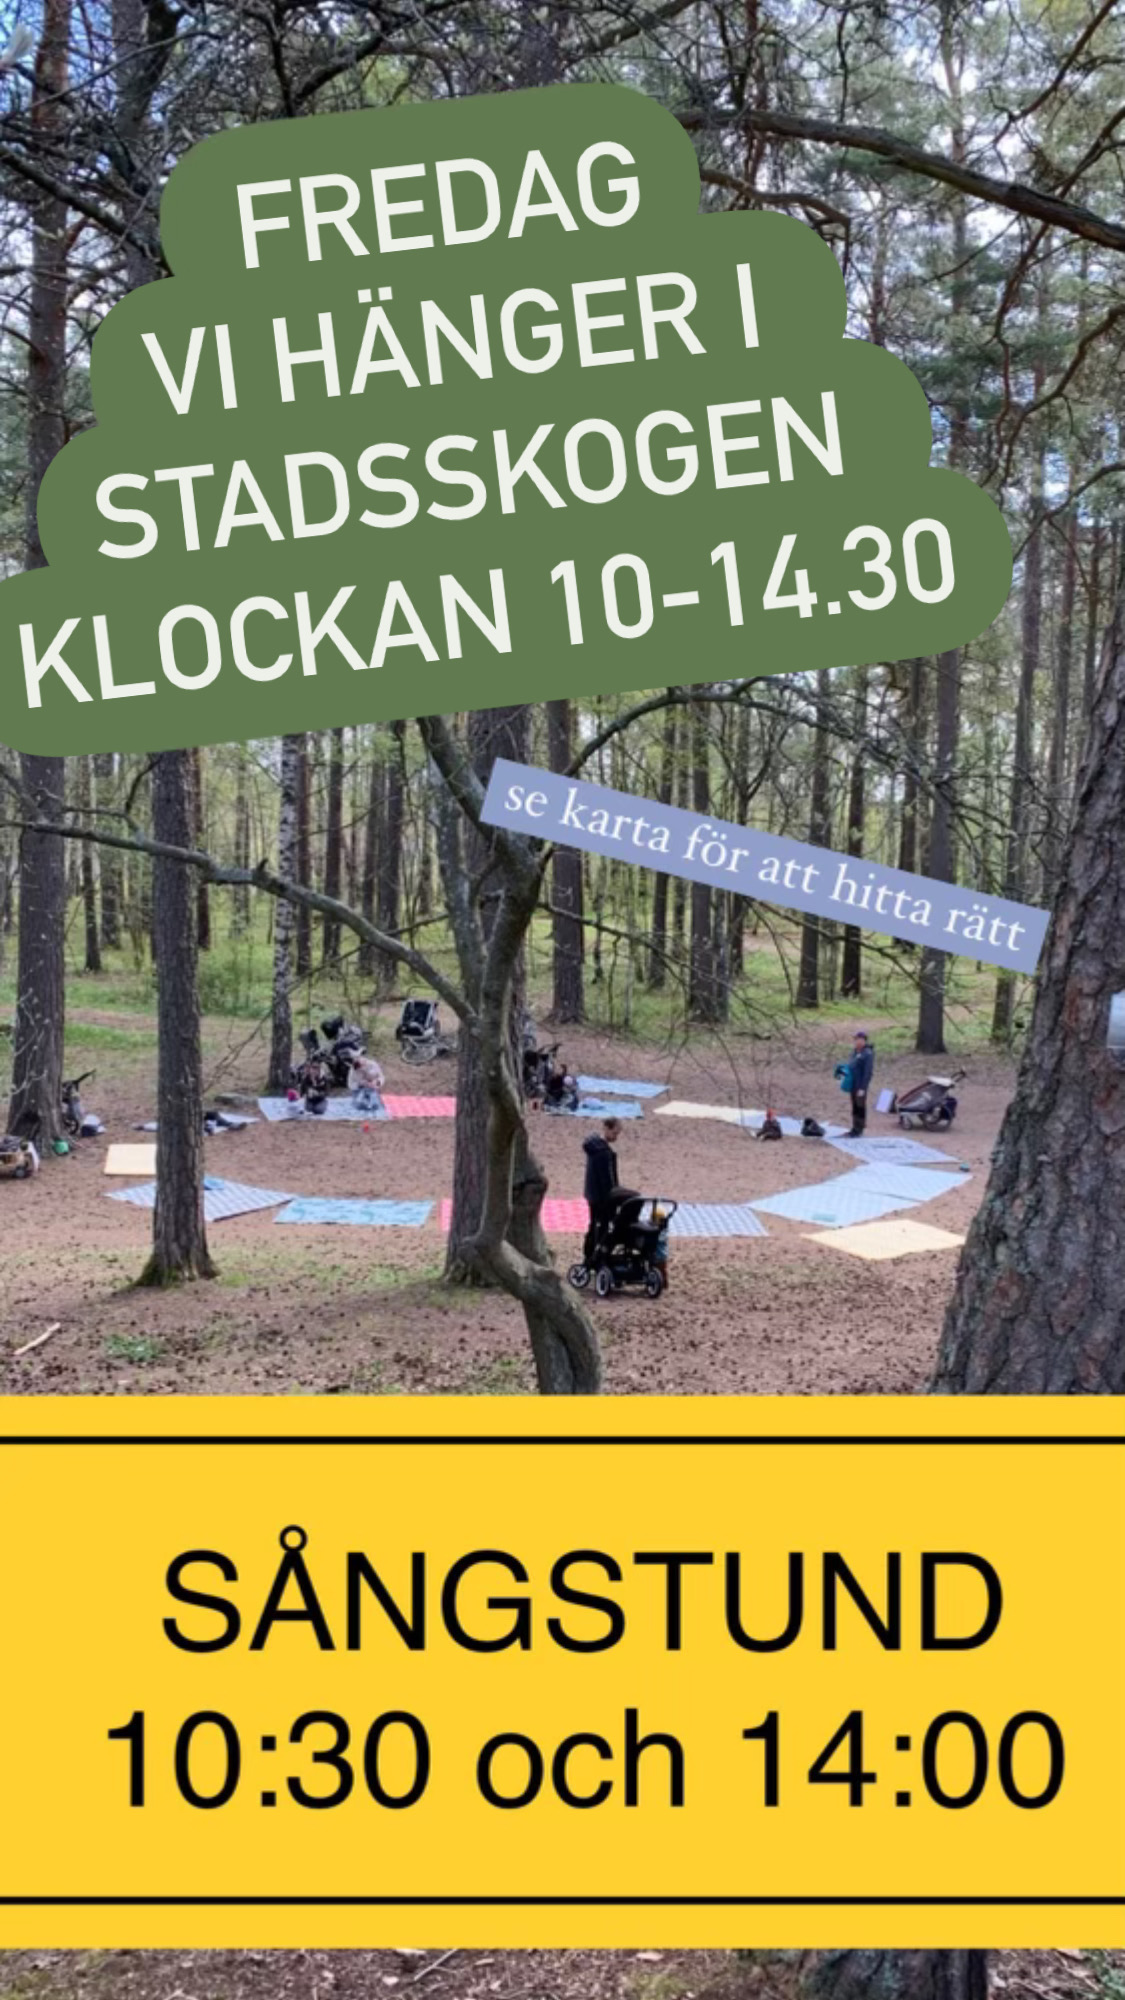 You are currently viewing Fredagshäng i Stadsskogen